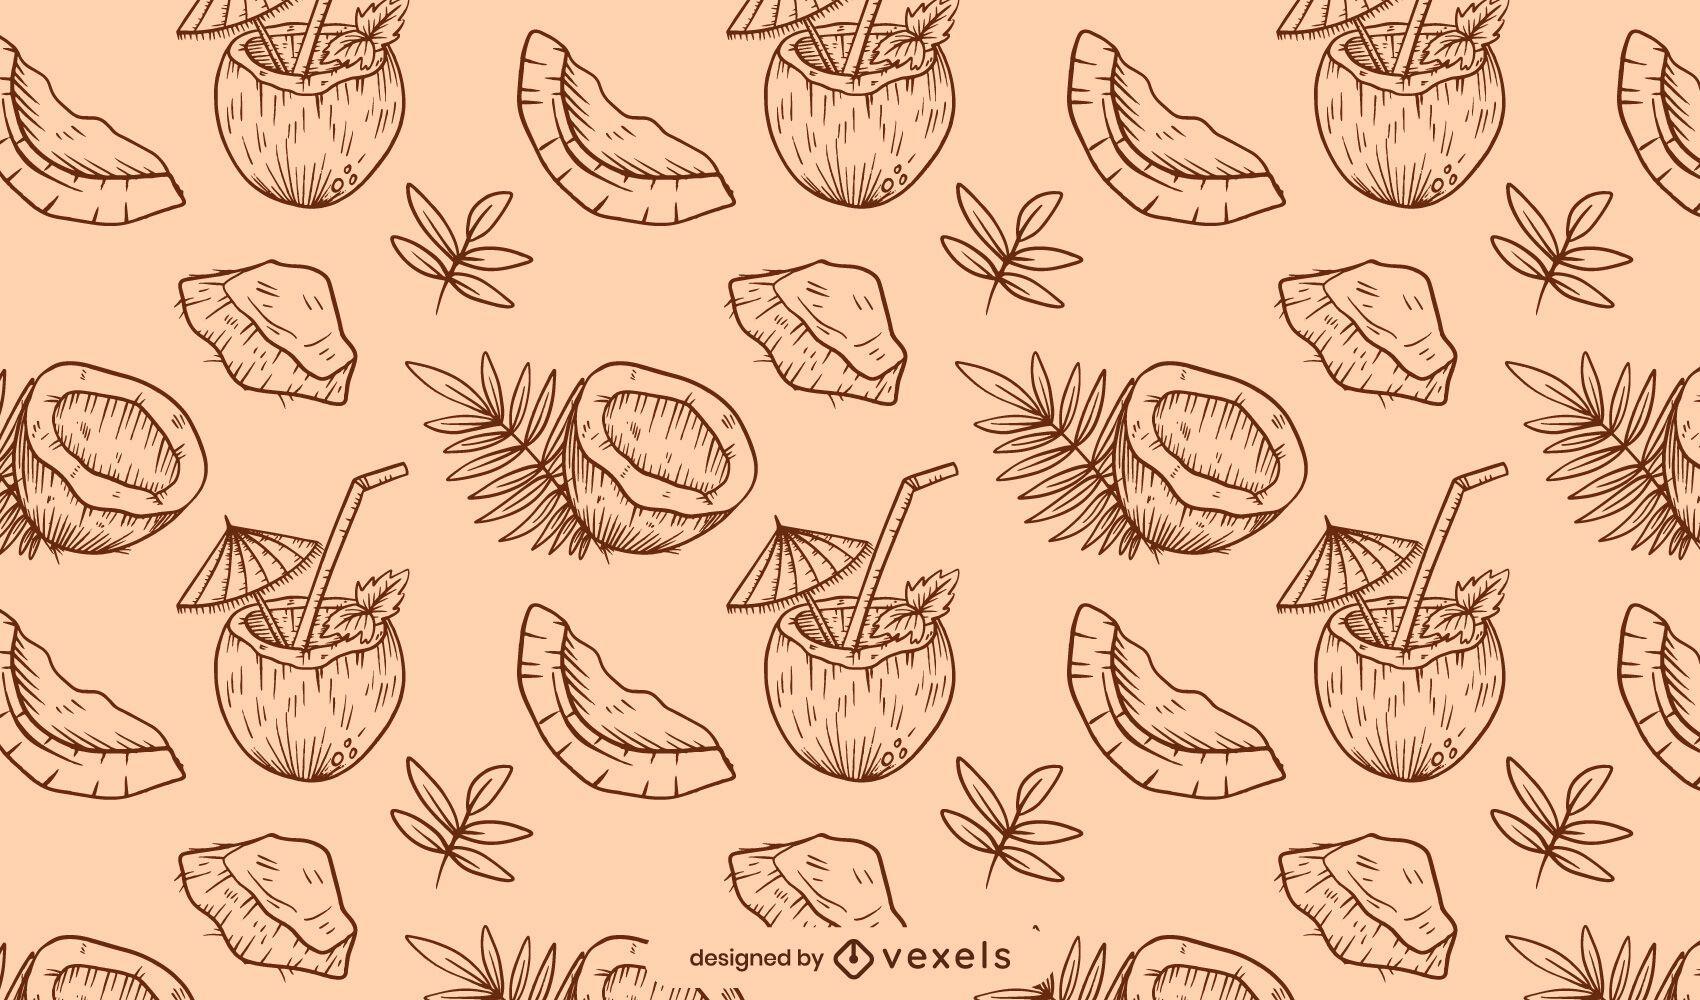 Hand drawn coconut pattern design